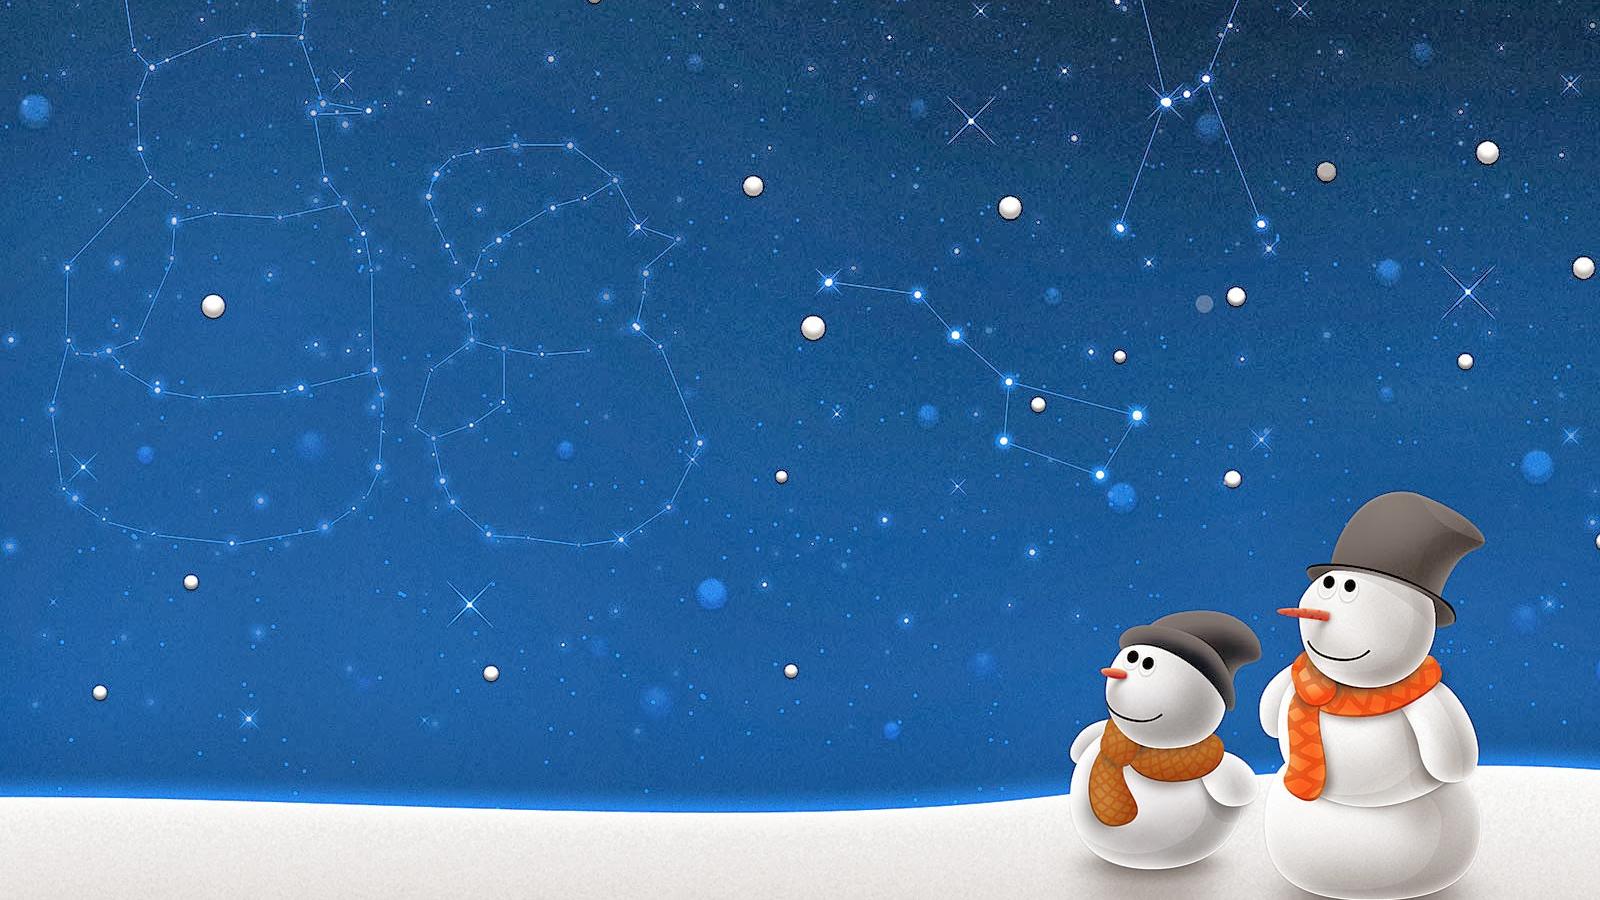 Sfondi Natalizi Tablet.Free Download Sfondi Natalizi Per Tablet Android Christmas Wallpaper